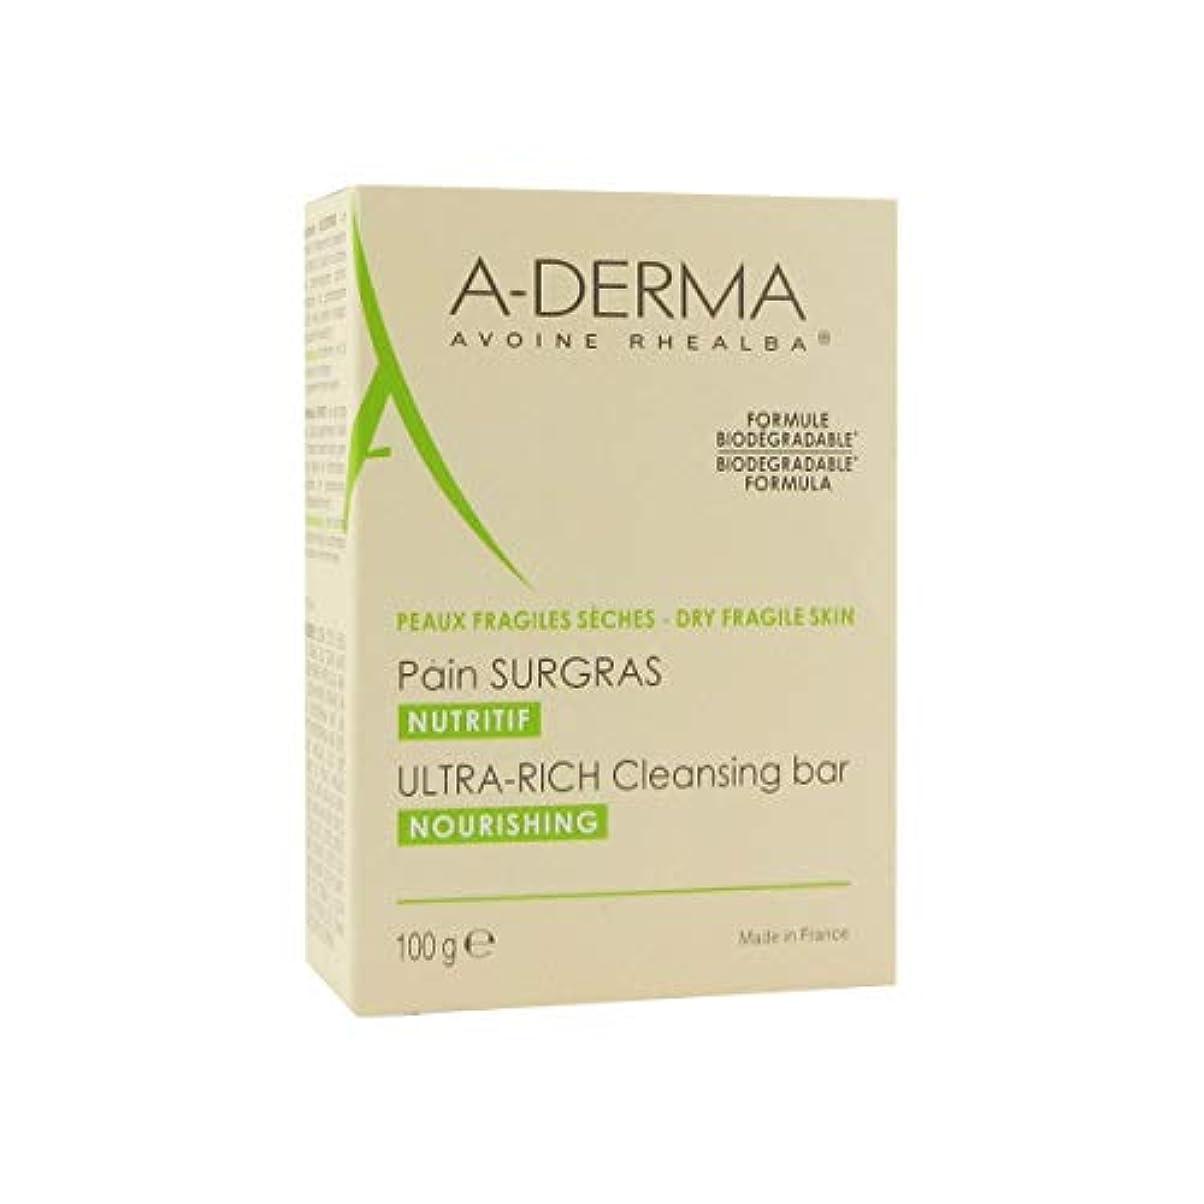 疎外ヤギ対抗A-derma Ultra-rich Cleansing Bar 100gr [並行輸入品]